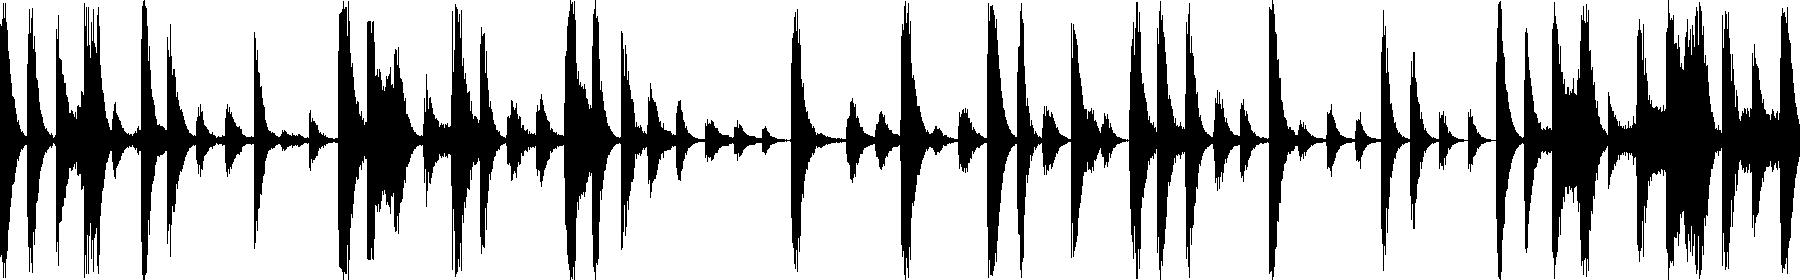 shg percussion loop 07